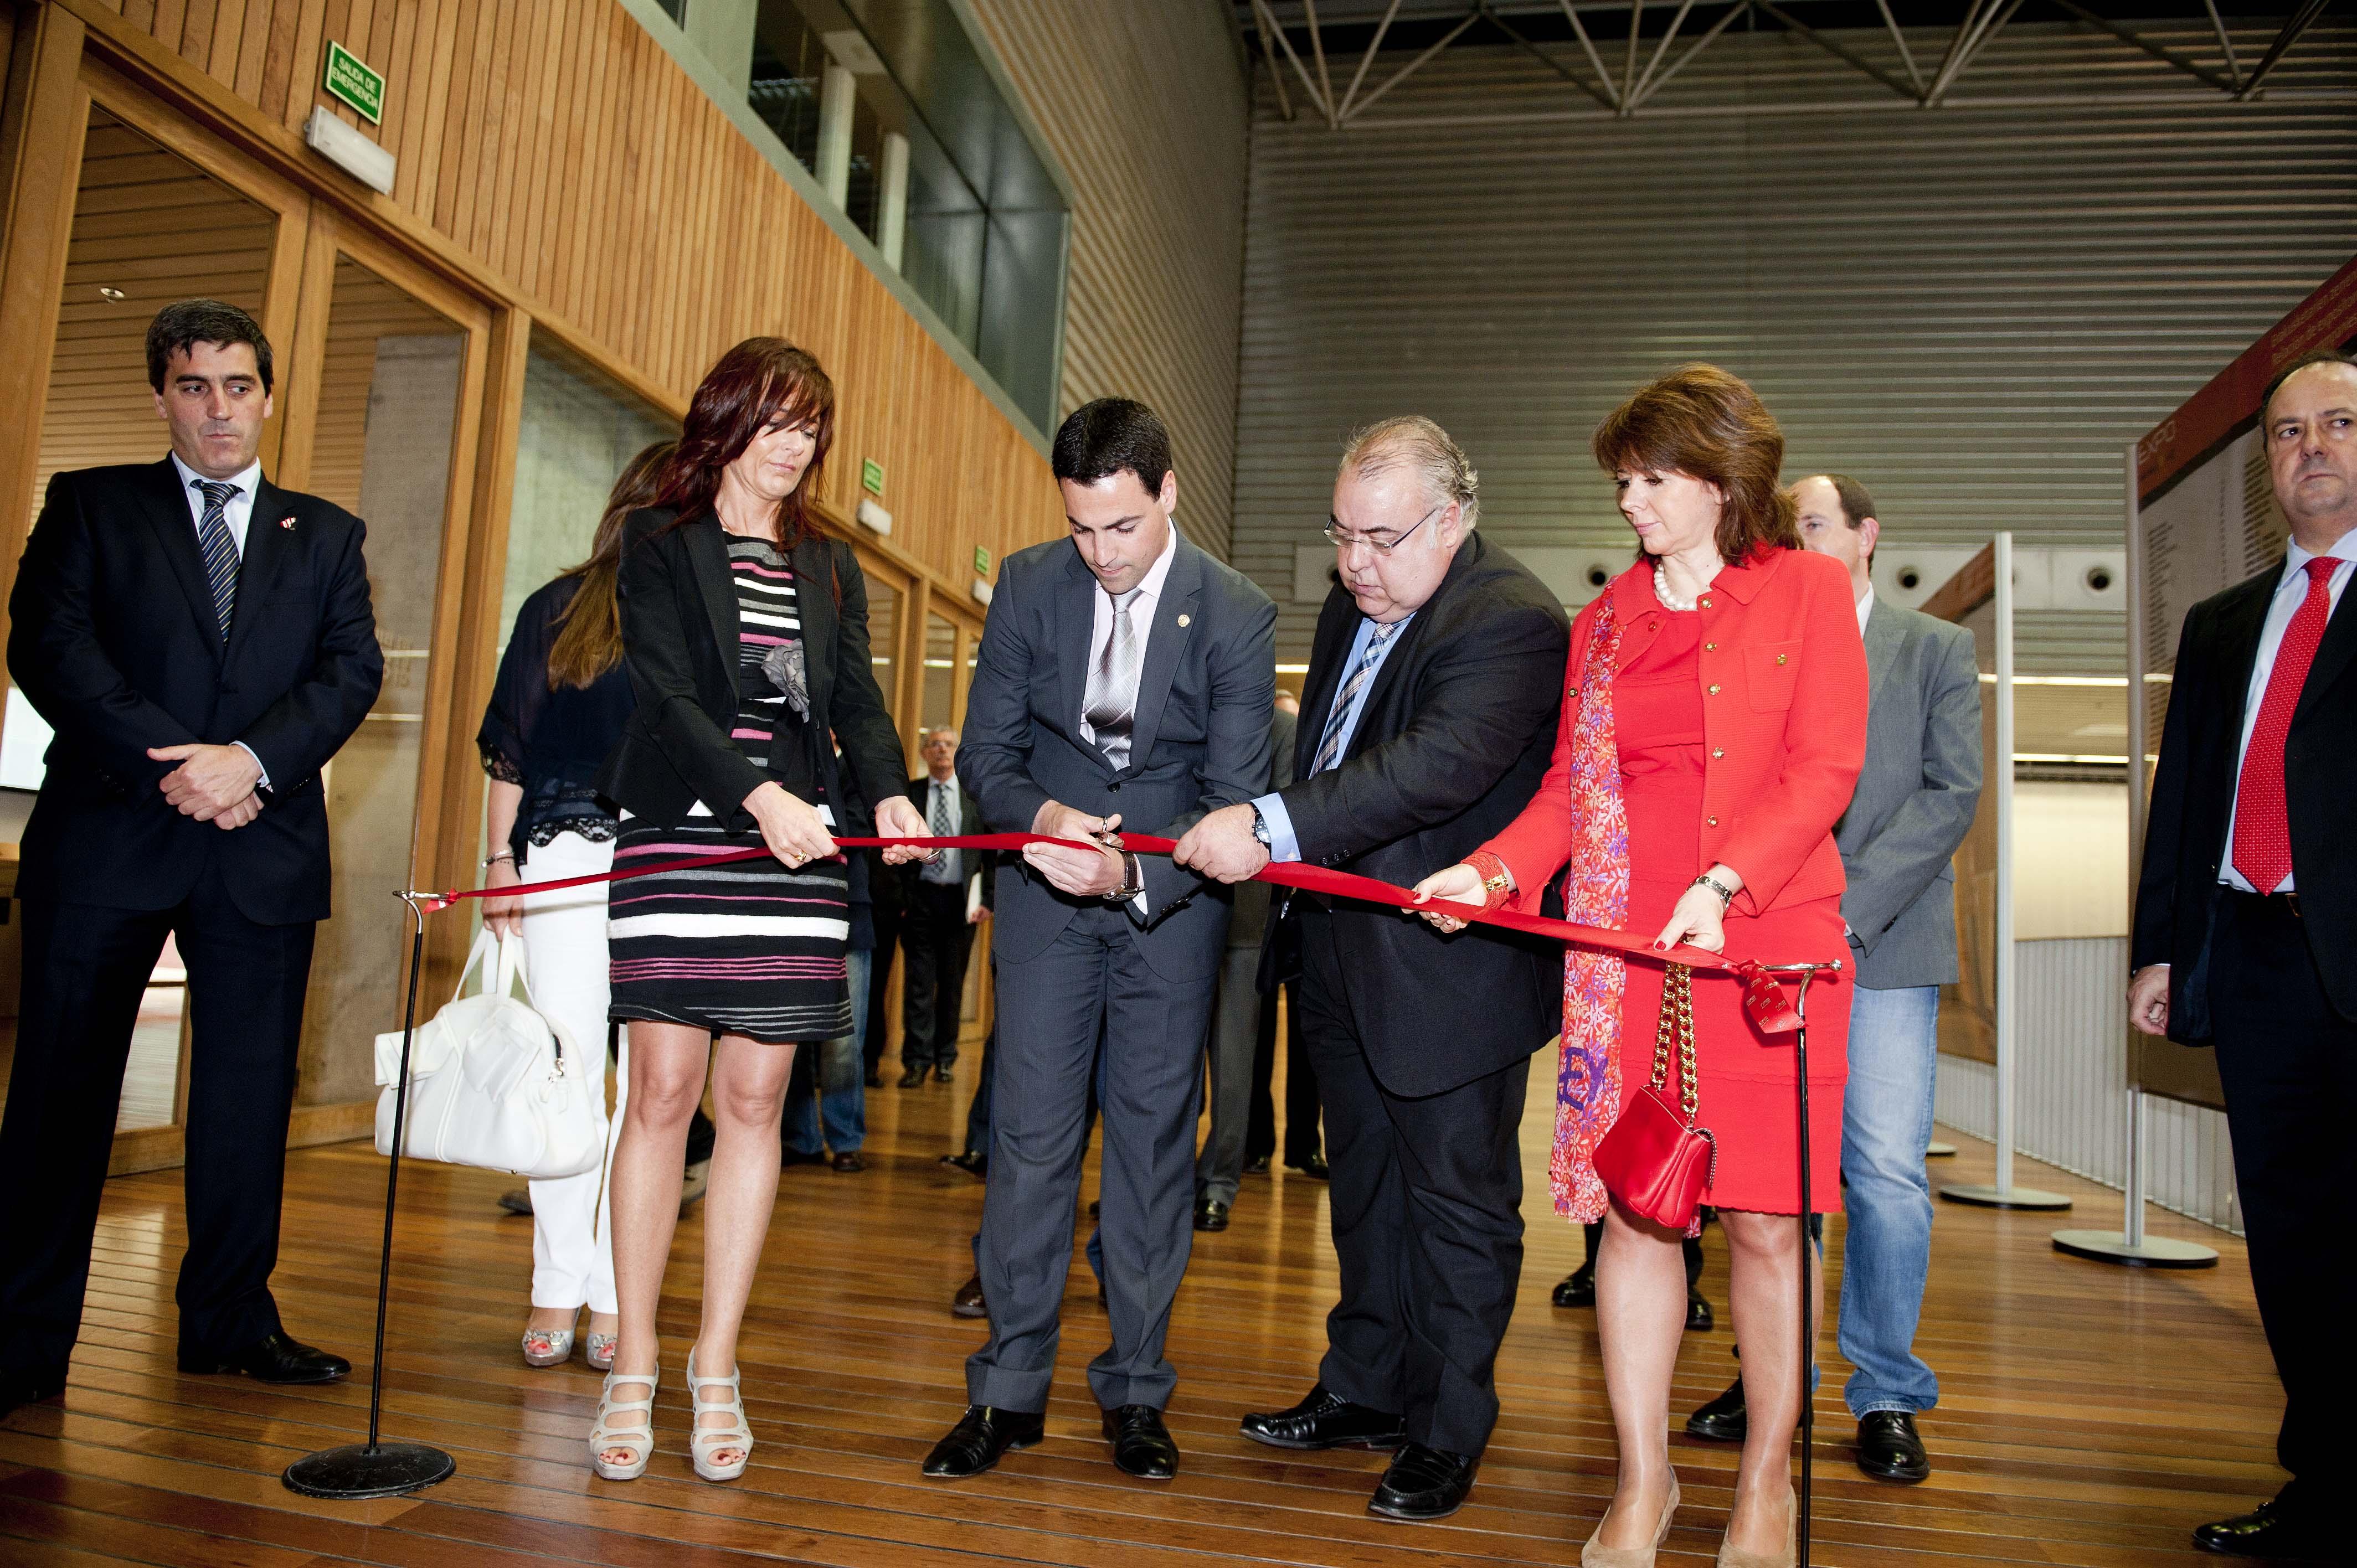 2012_05_10_zorrilla_inauguracion_expovacaciones_10.jpg